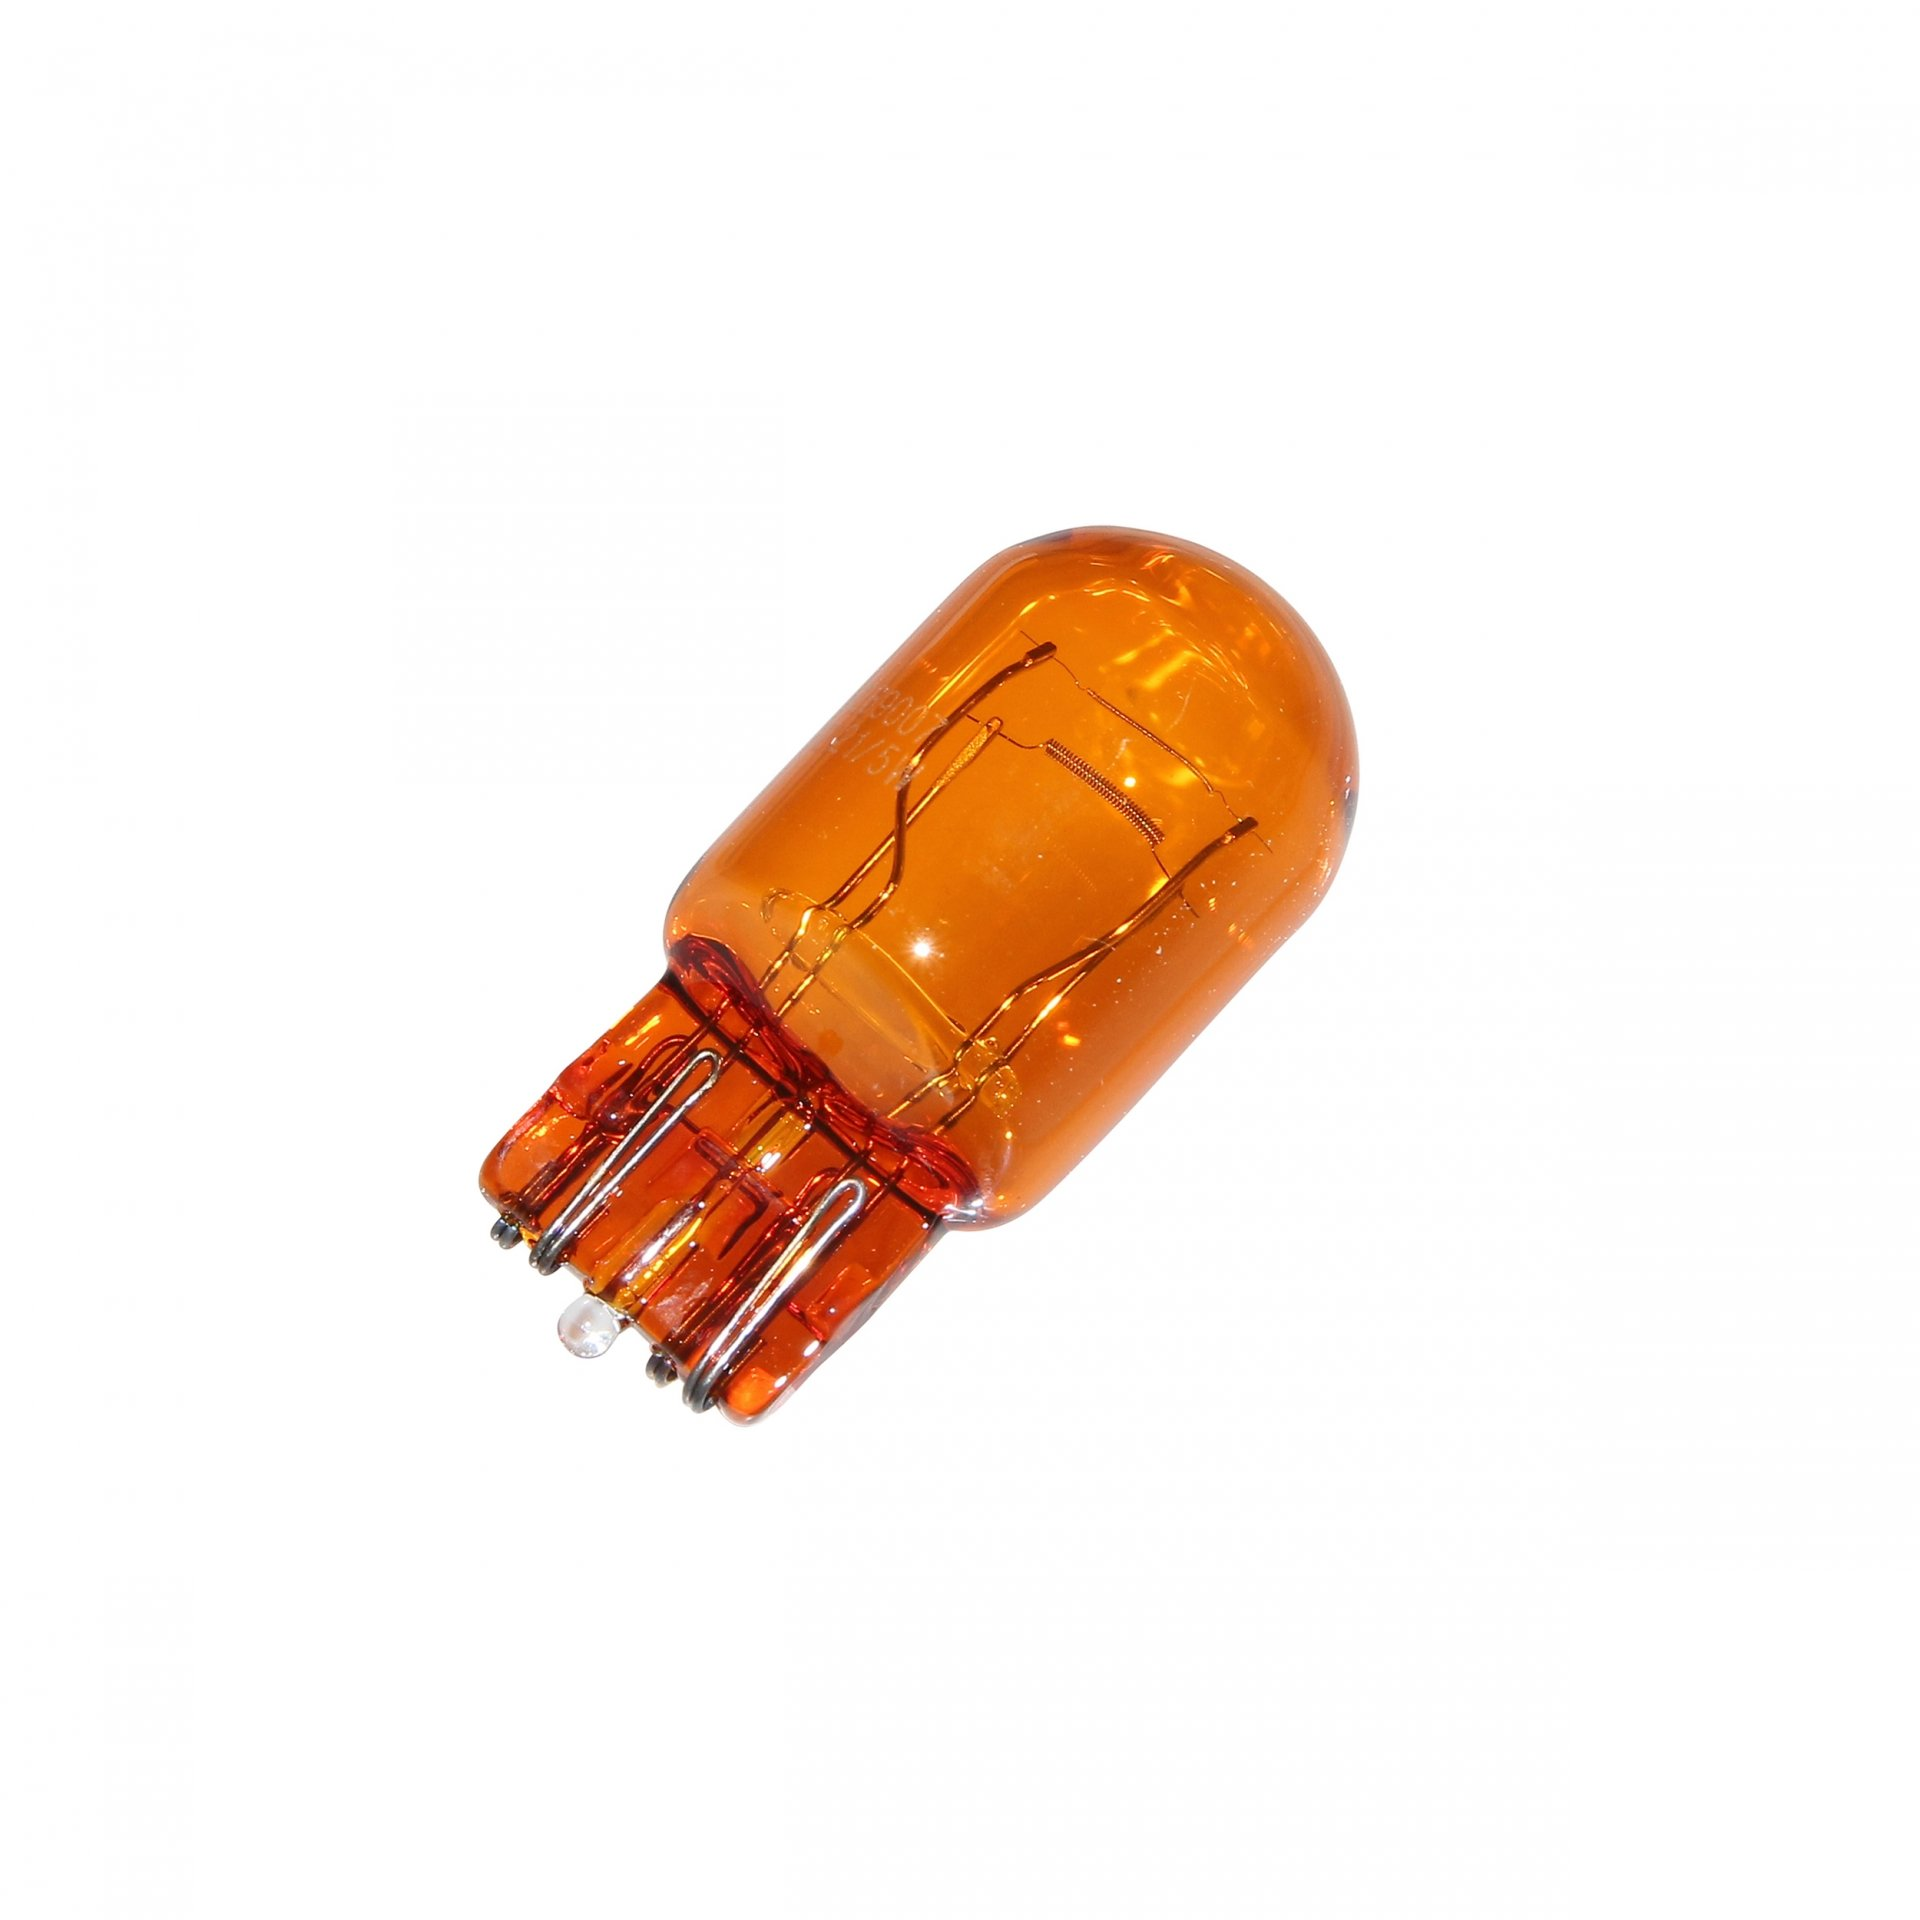 Ampoules Flosser 12V 21-5W W3W orange (x10)